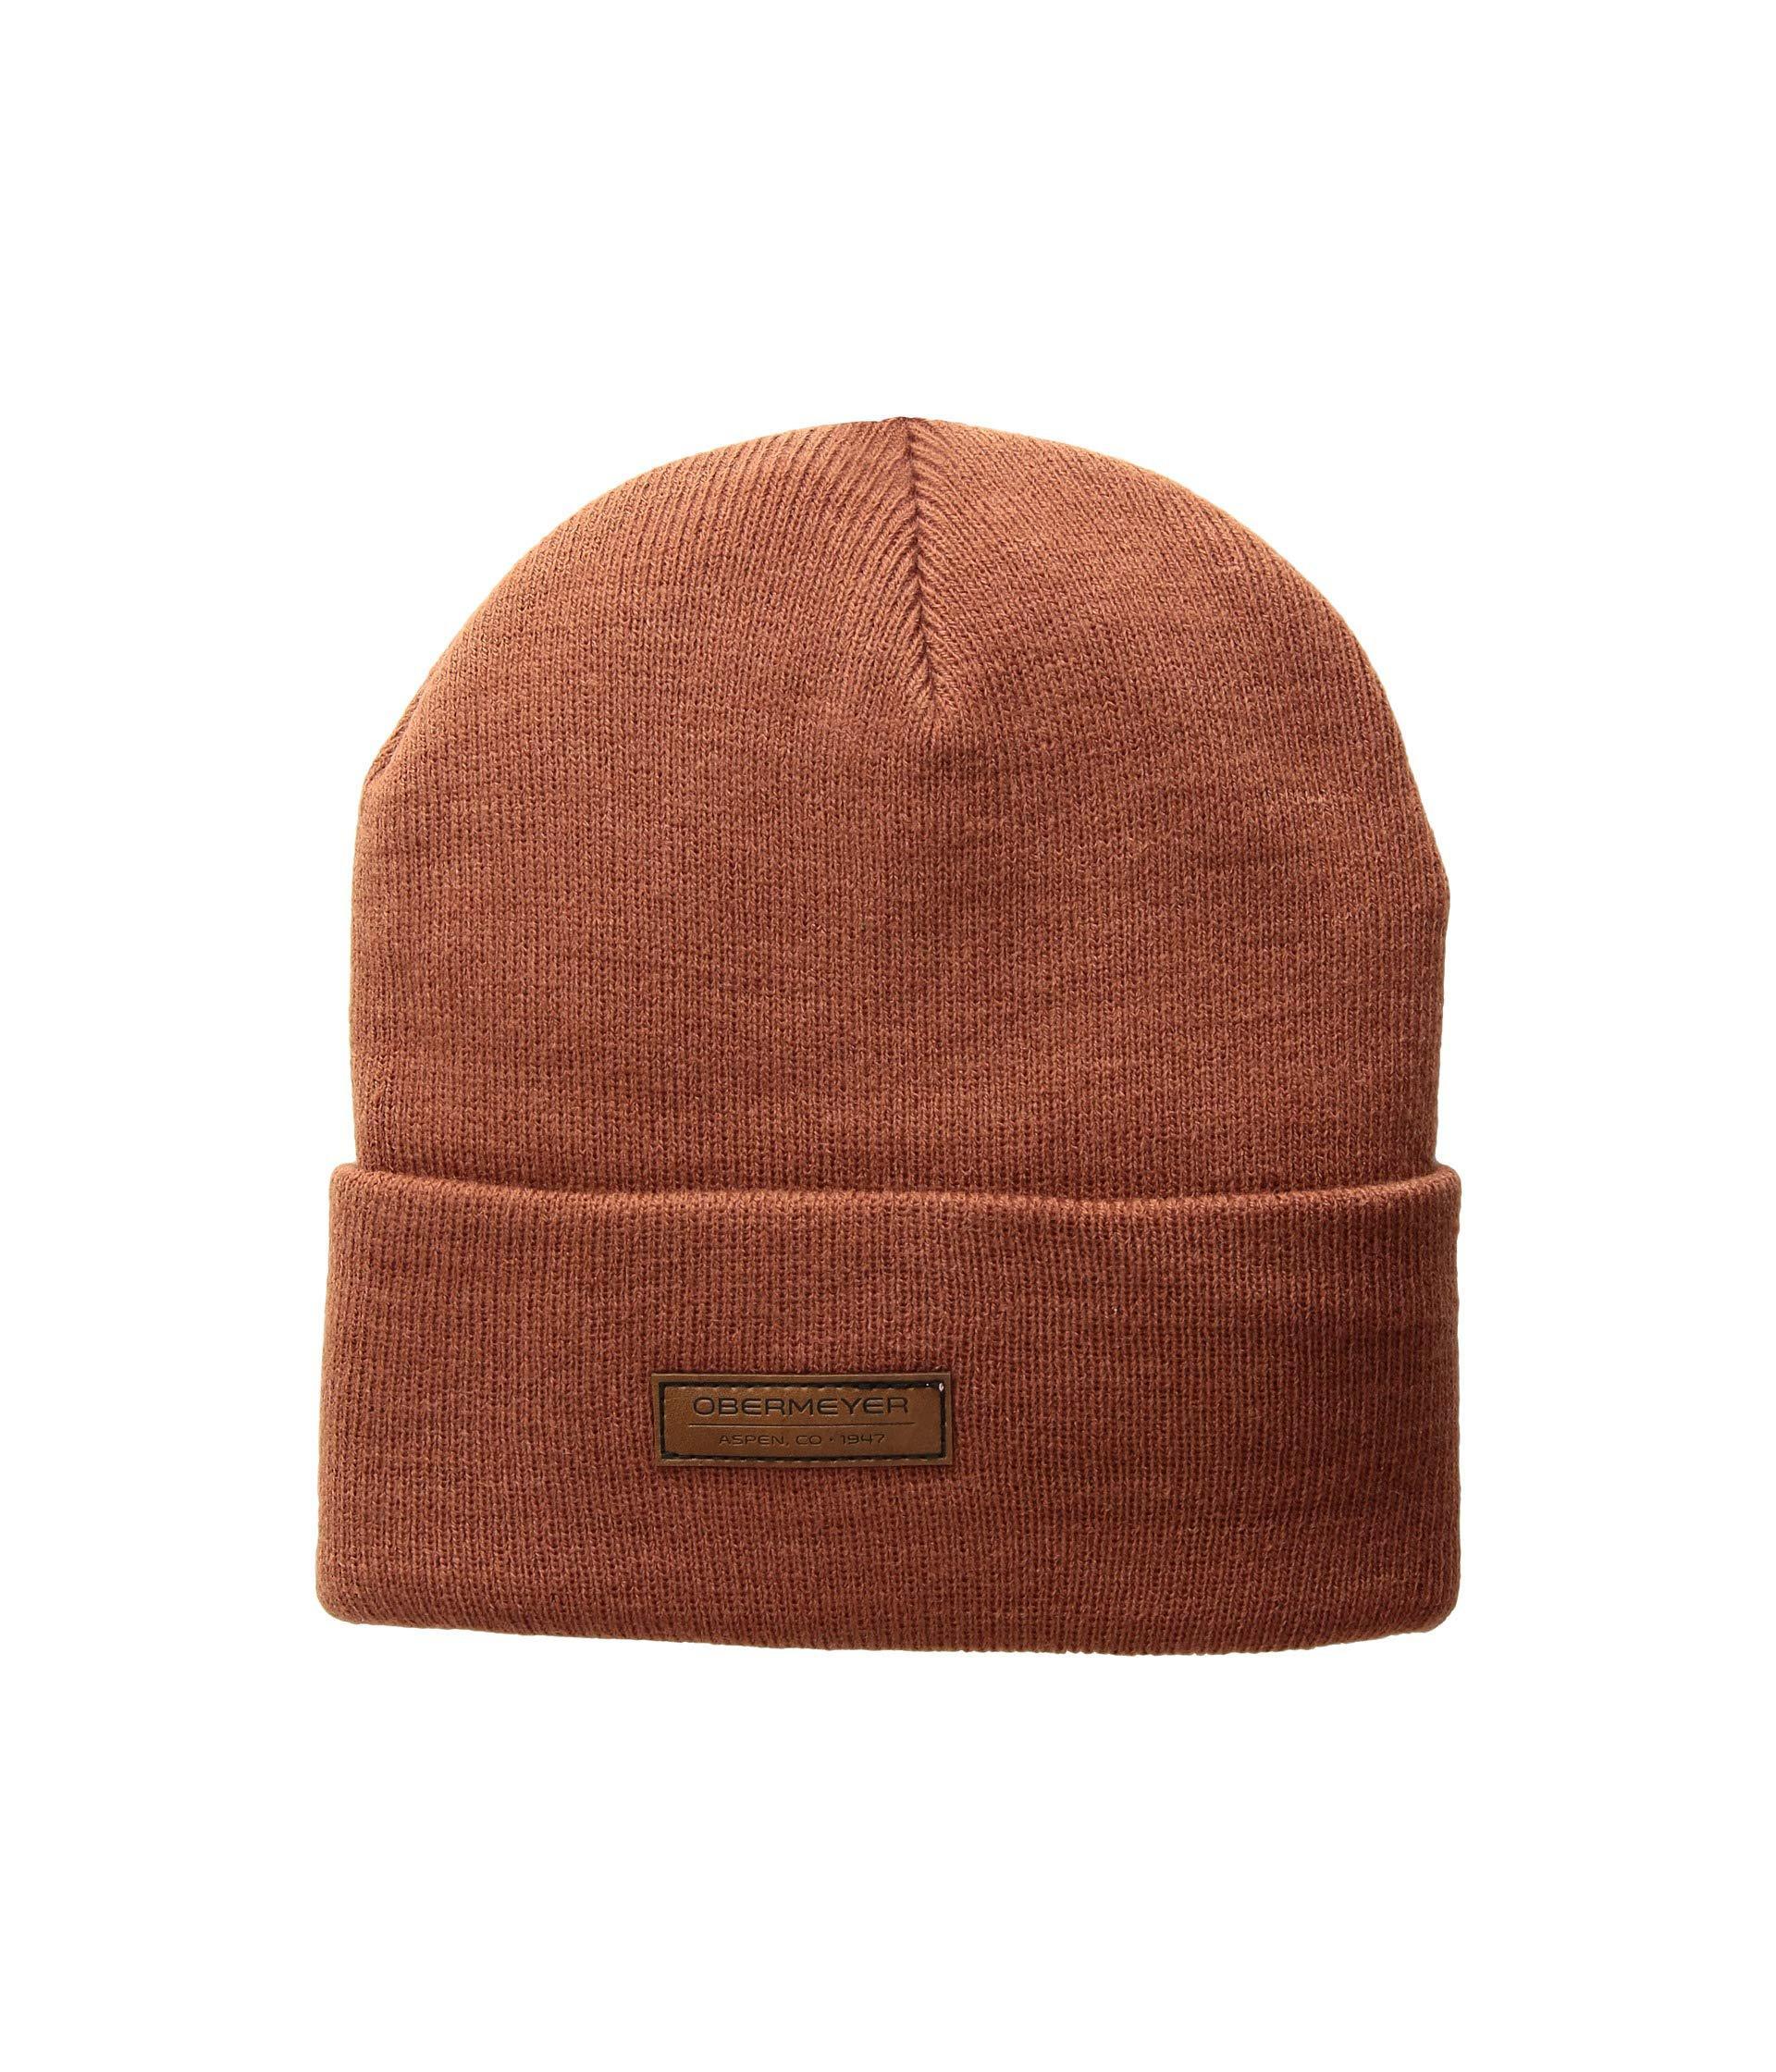 f9e0b442e14 Obermeyer - Brown Fold-over Knit Hat (rawhide Red) Caps for Men -. View  fullscreen